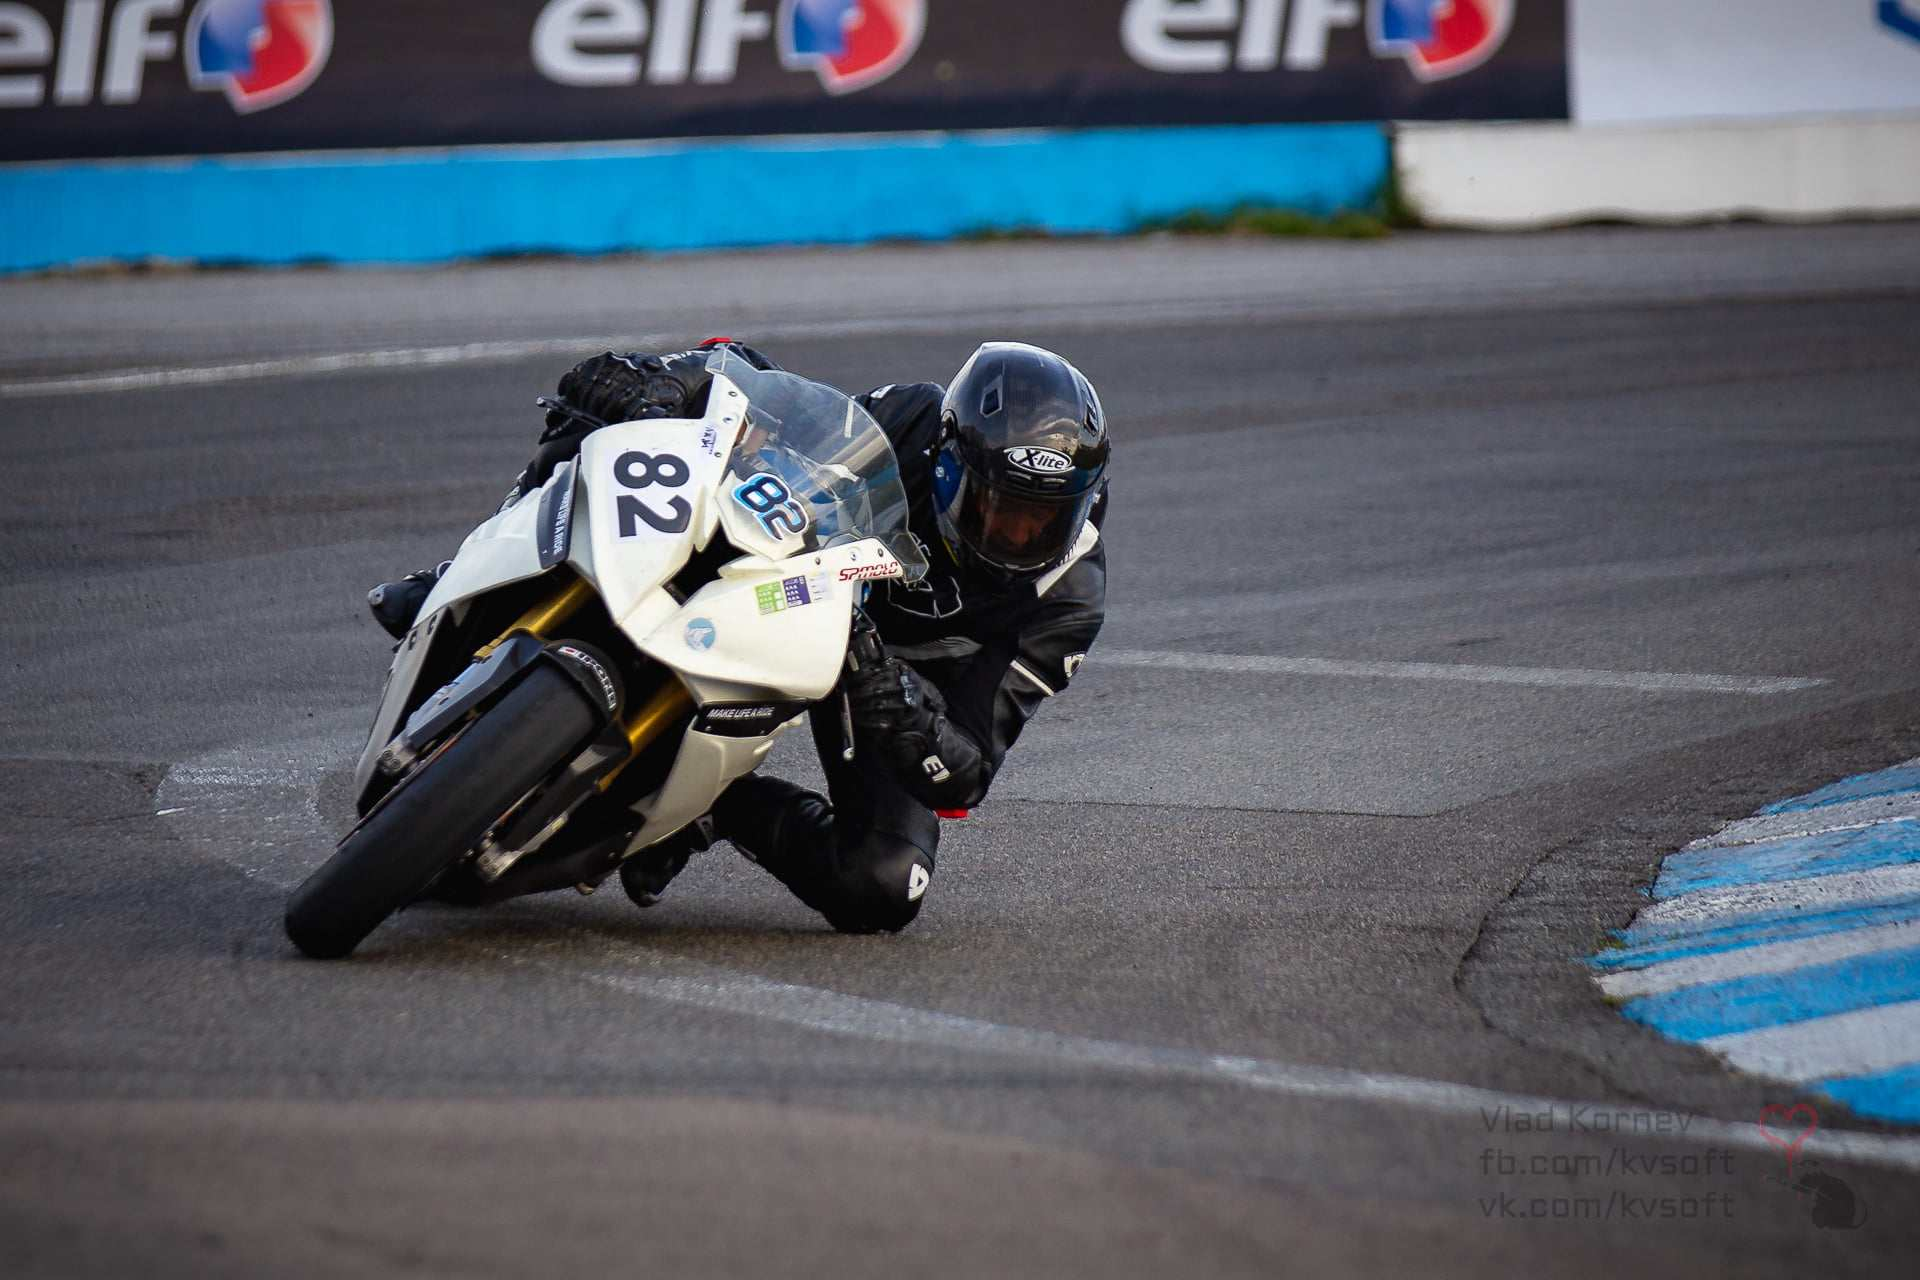 5-6_etap_MotoGPUkraine_165